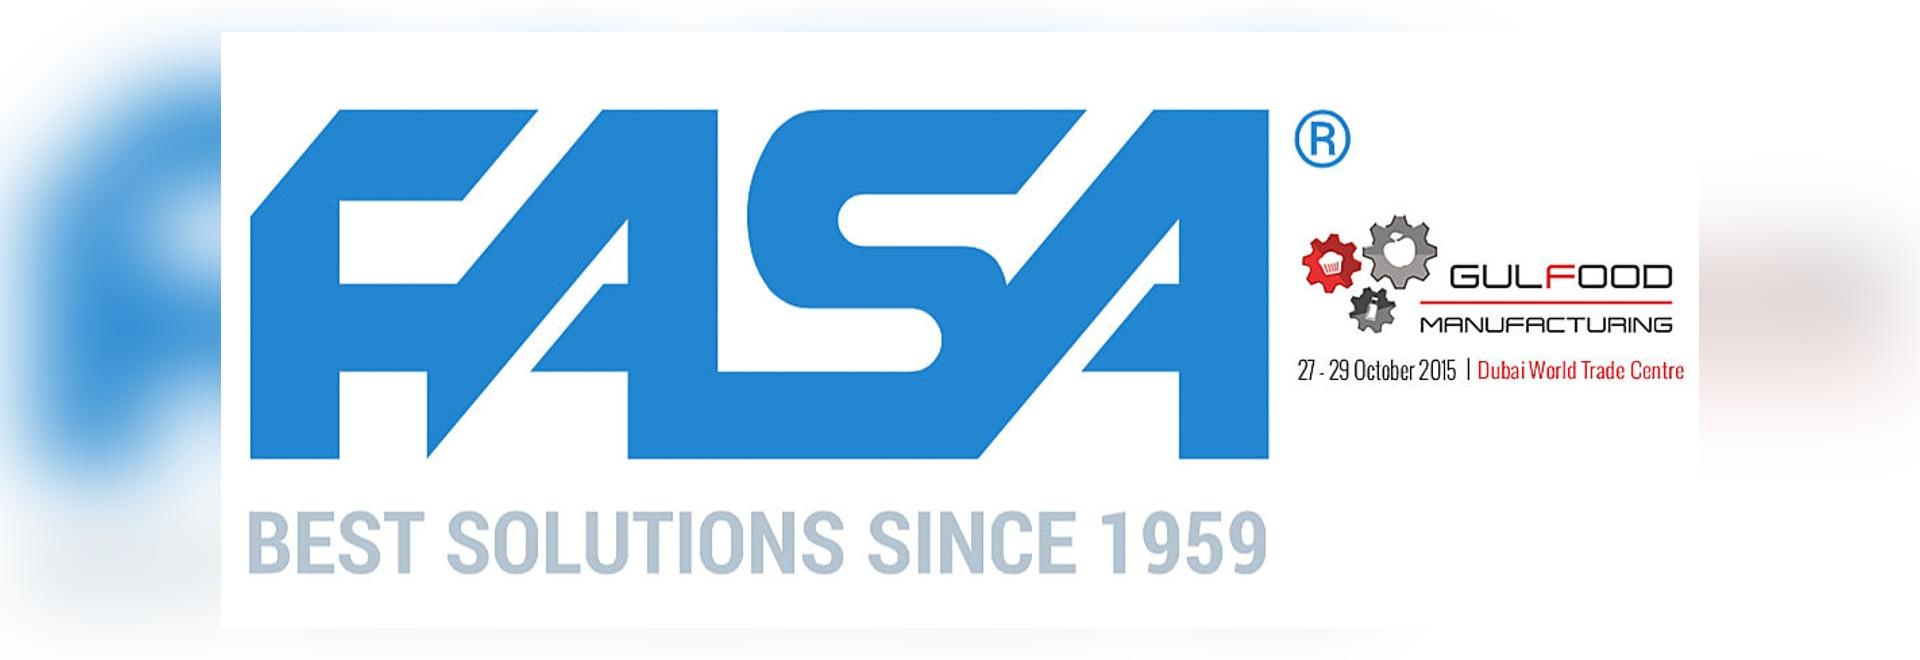 FASA Stand At Gulfood Manufacturing 2015